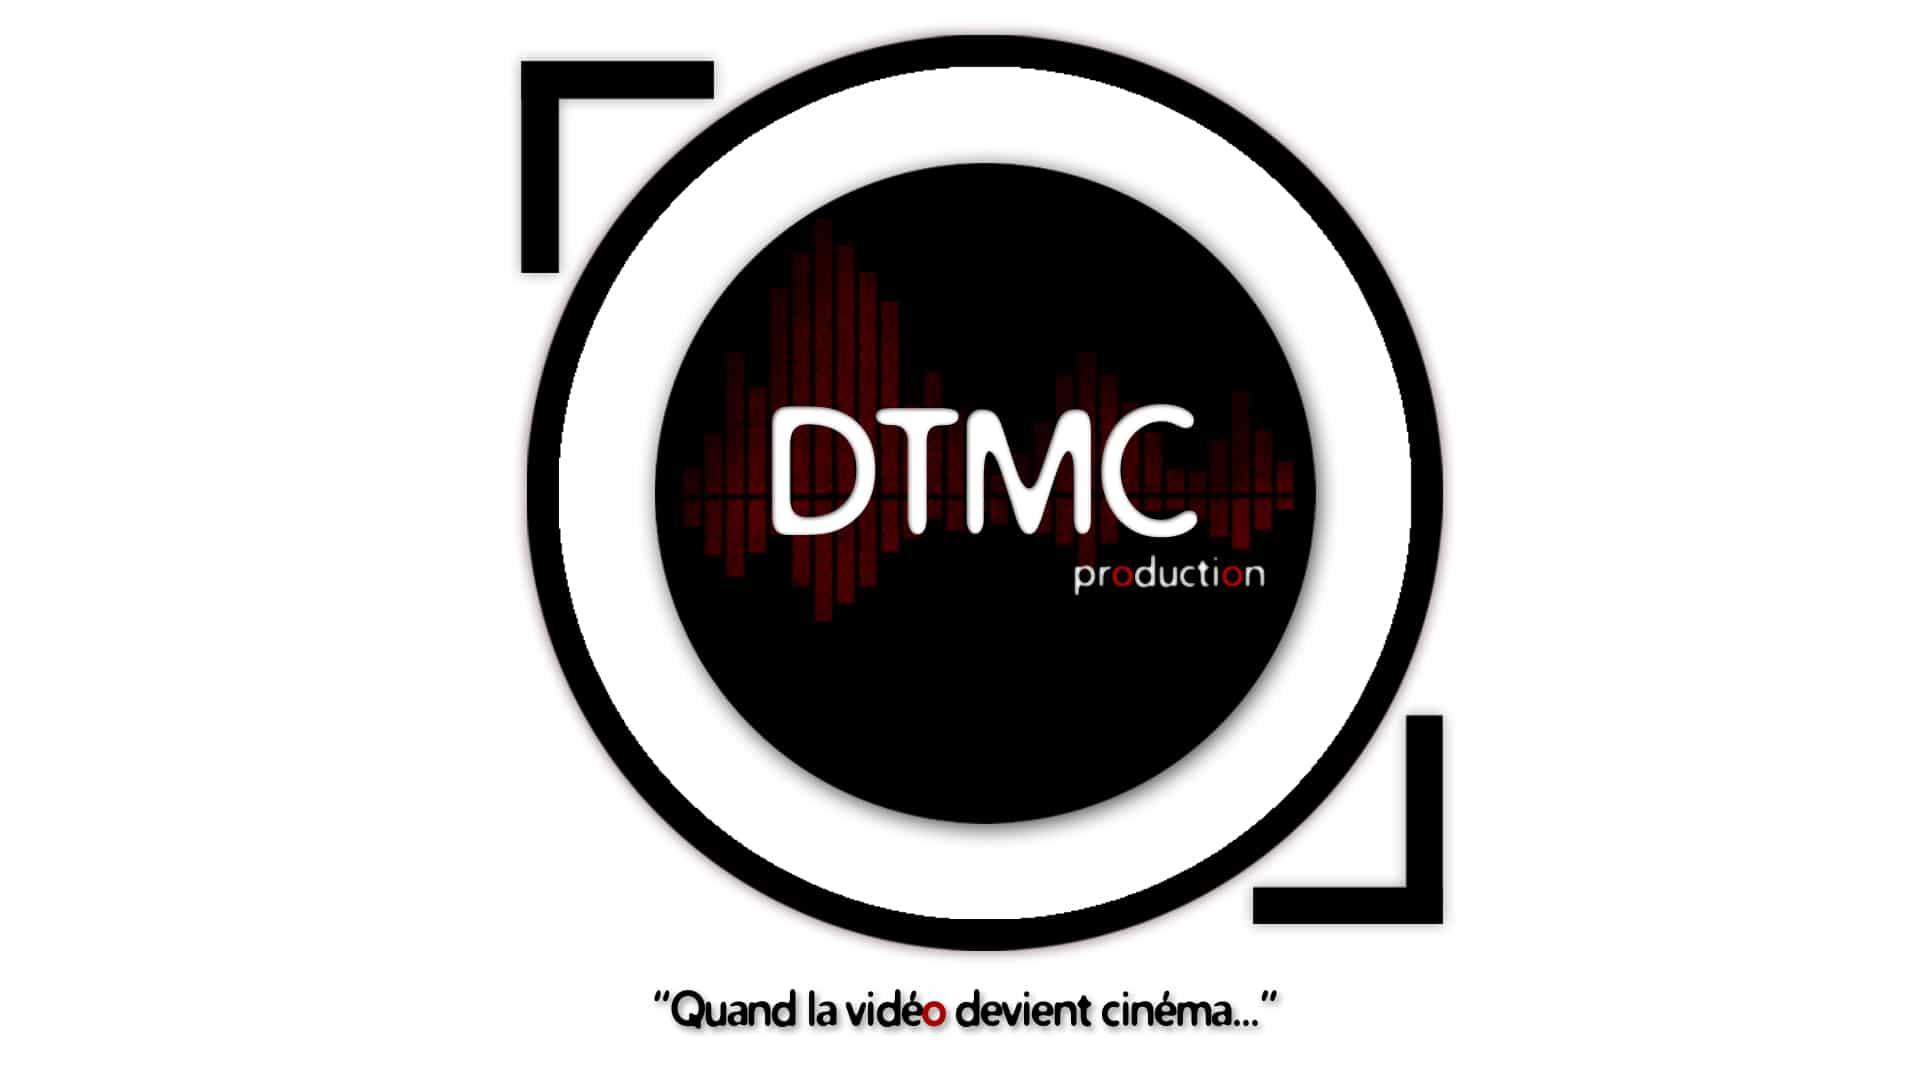 Logo DTMC